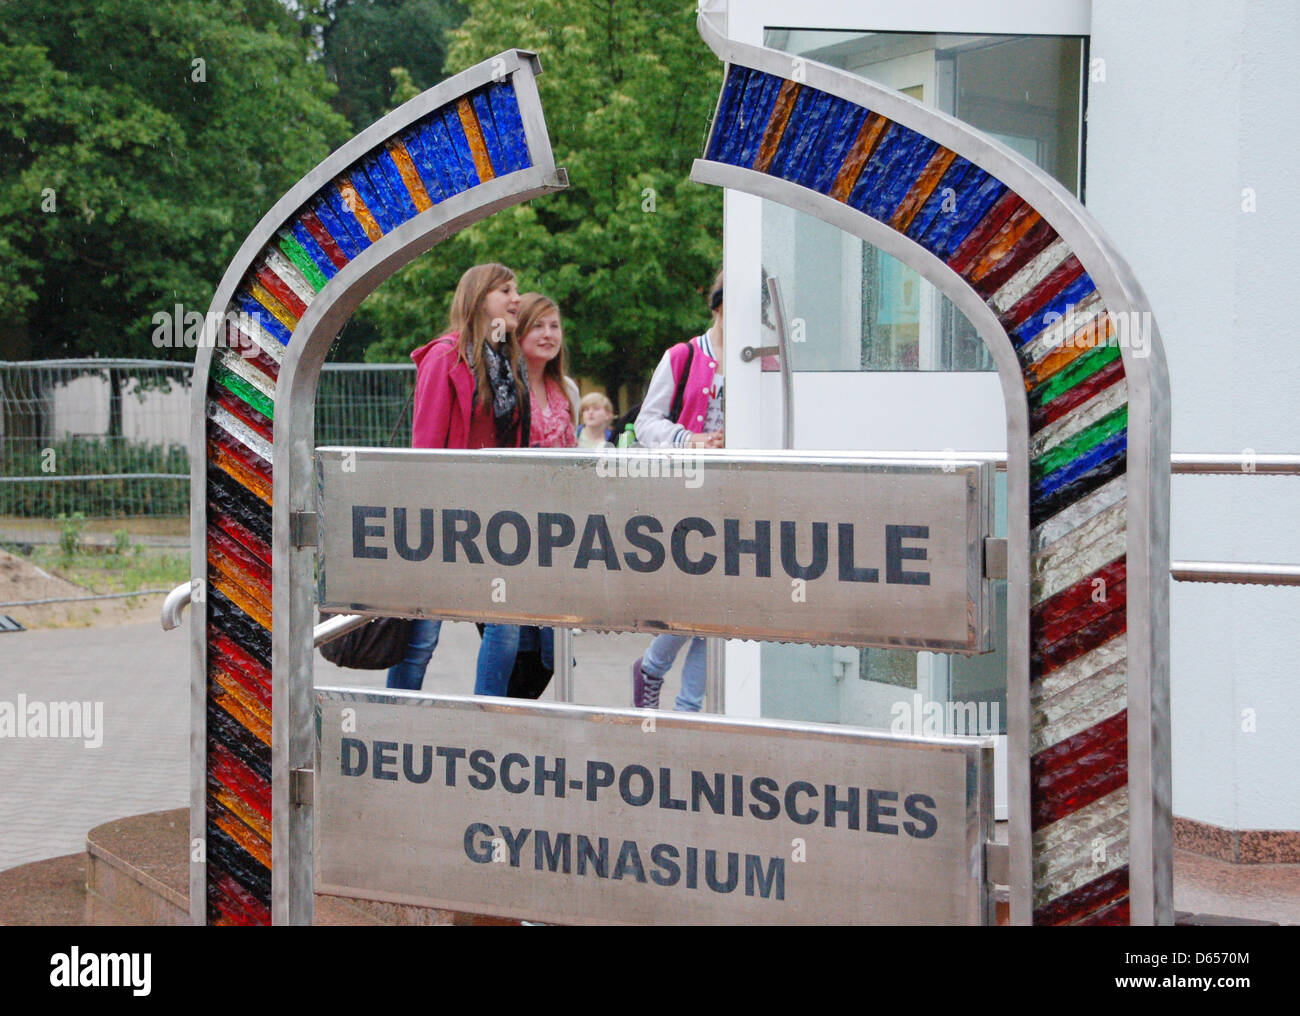 Pupils of Gymnasium Loecknitz enter their school in Loecknitz, Germany, 12 June 2012. Europe has become evreyday - Stock Image